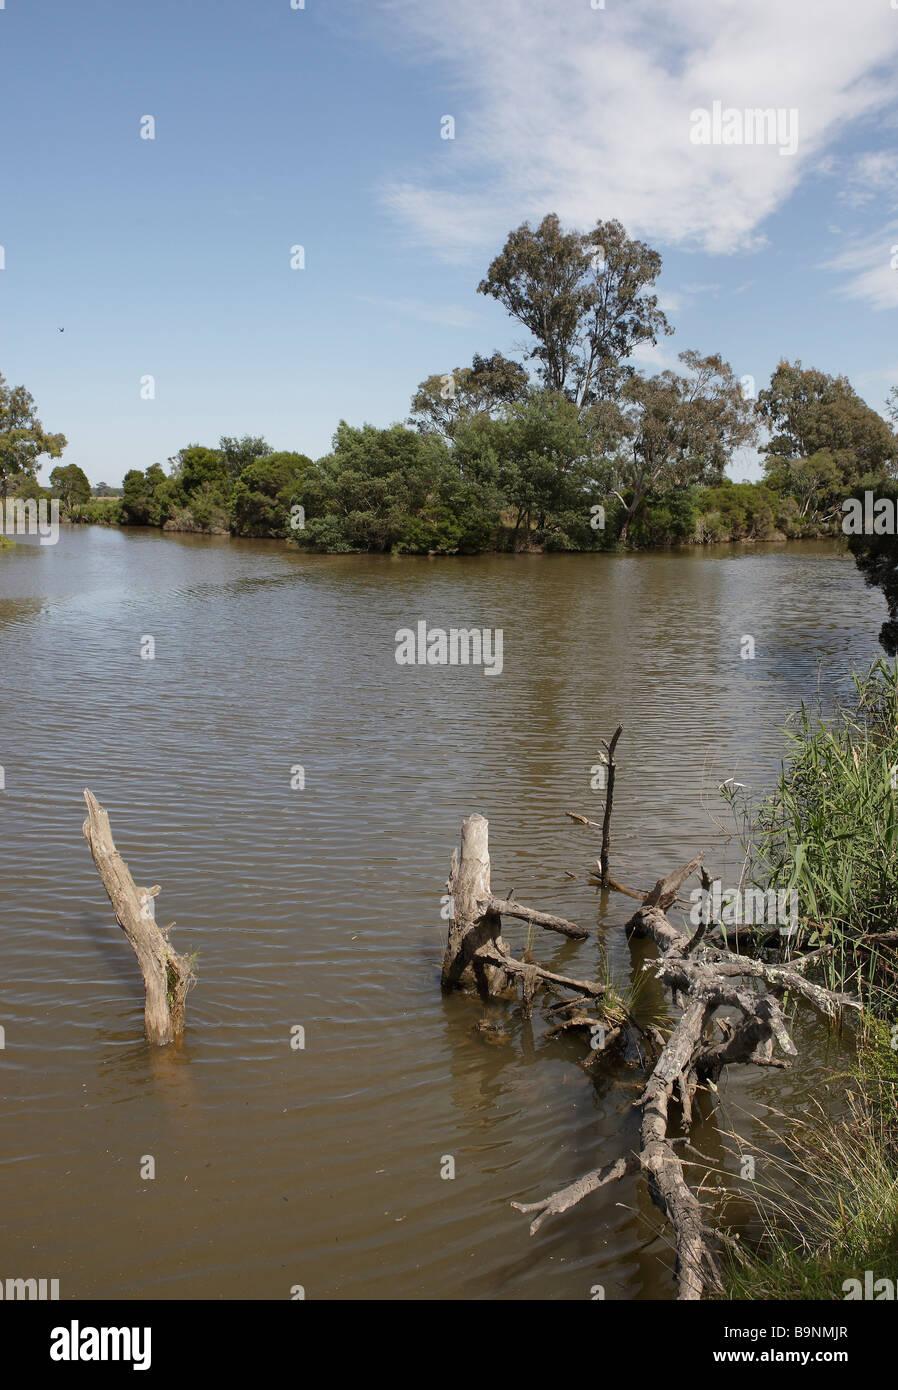 Confluence of the Latrobe River, left, and Thompson River, right, Sale, Gippsland, Victoria, Australia - Stock Image